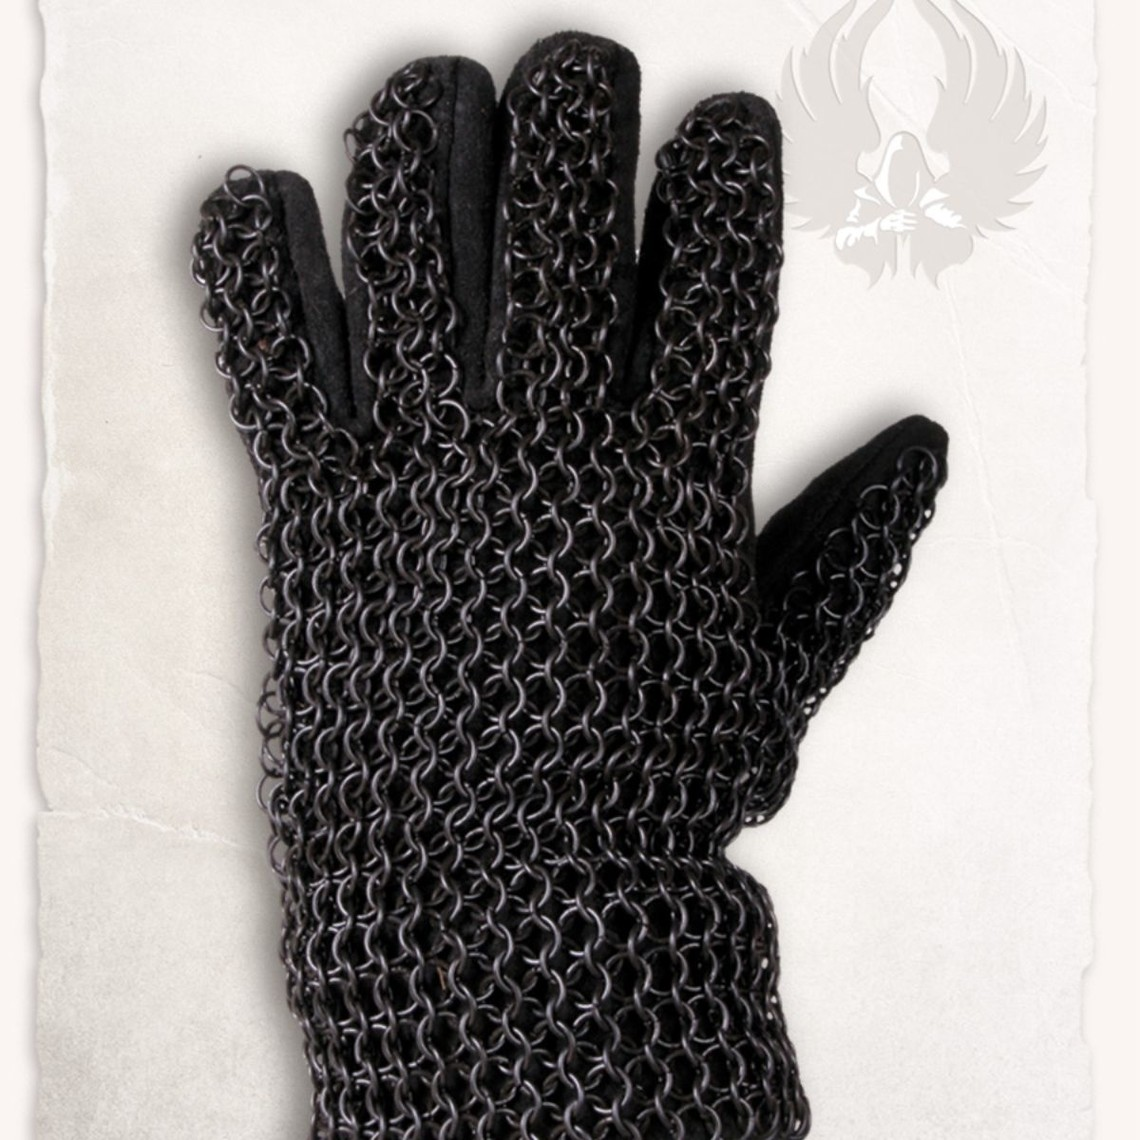 Mytholon Maliënhandschoenen Richard, gebronsd